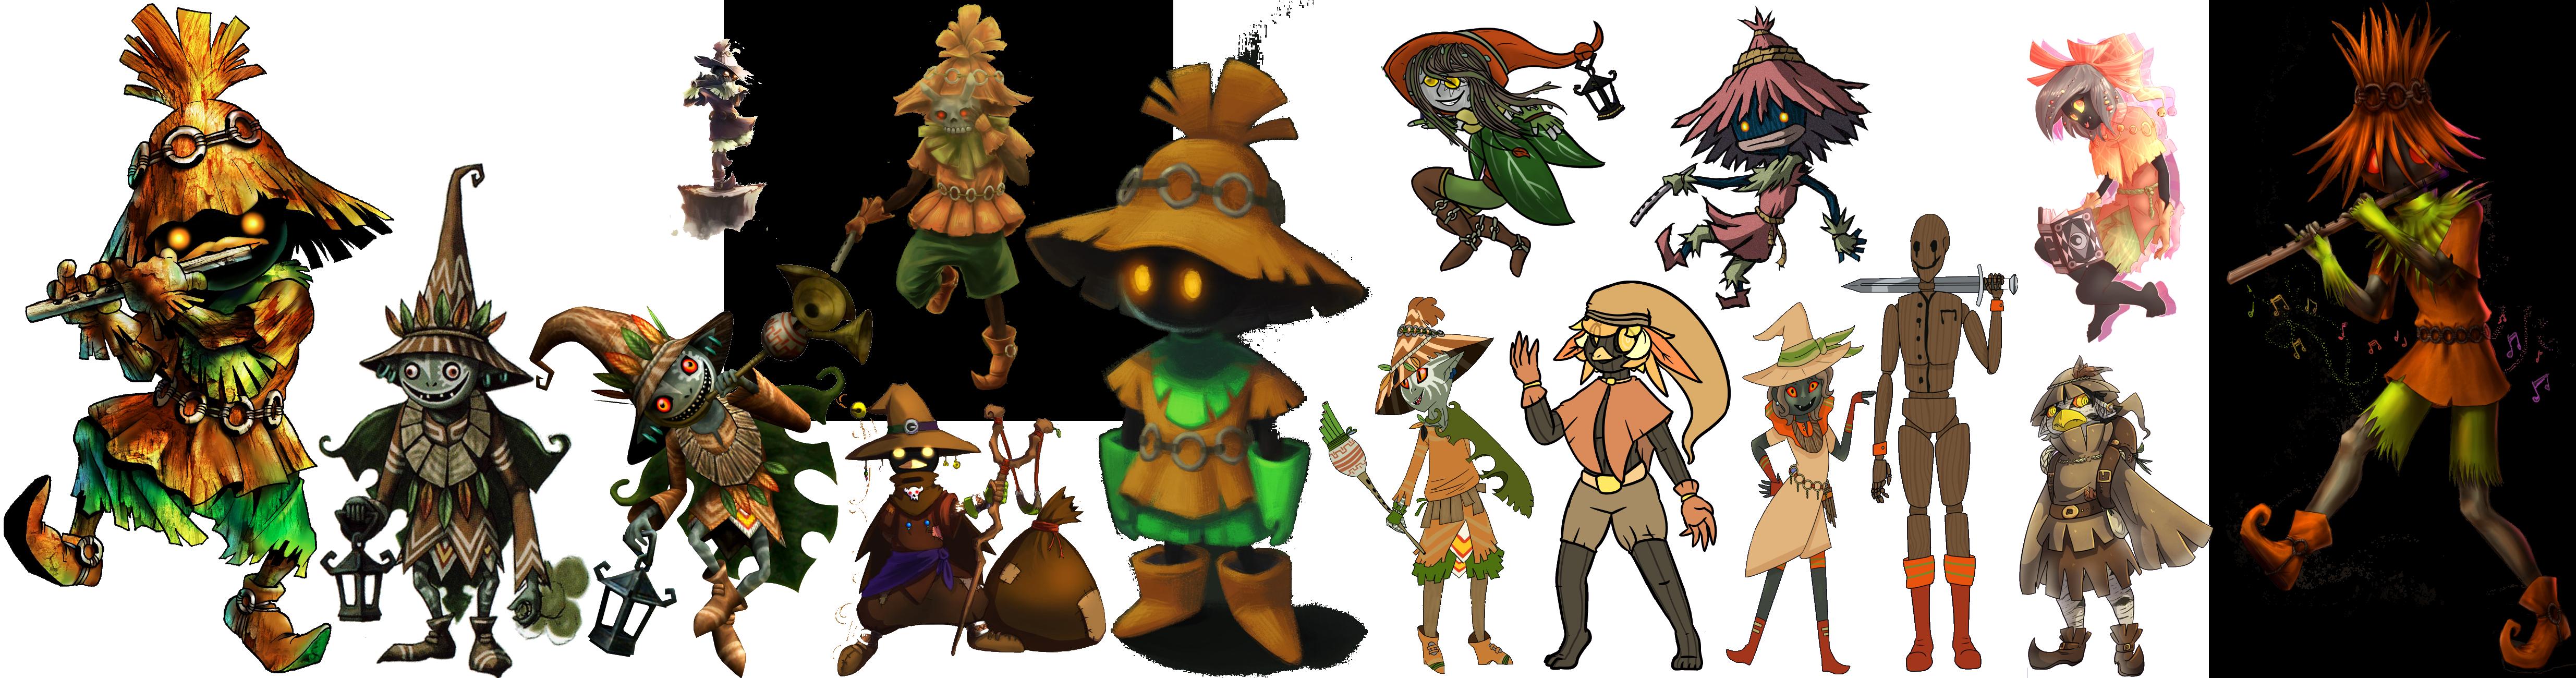 [CampagneS parallèles] Zelda LotR - 3*5 places LINEUPunscaledSKULLKID